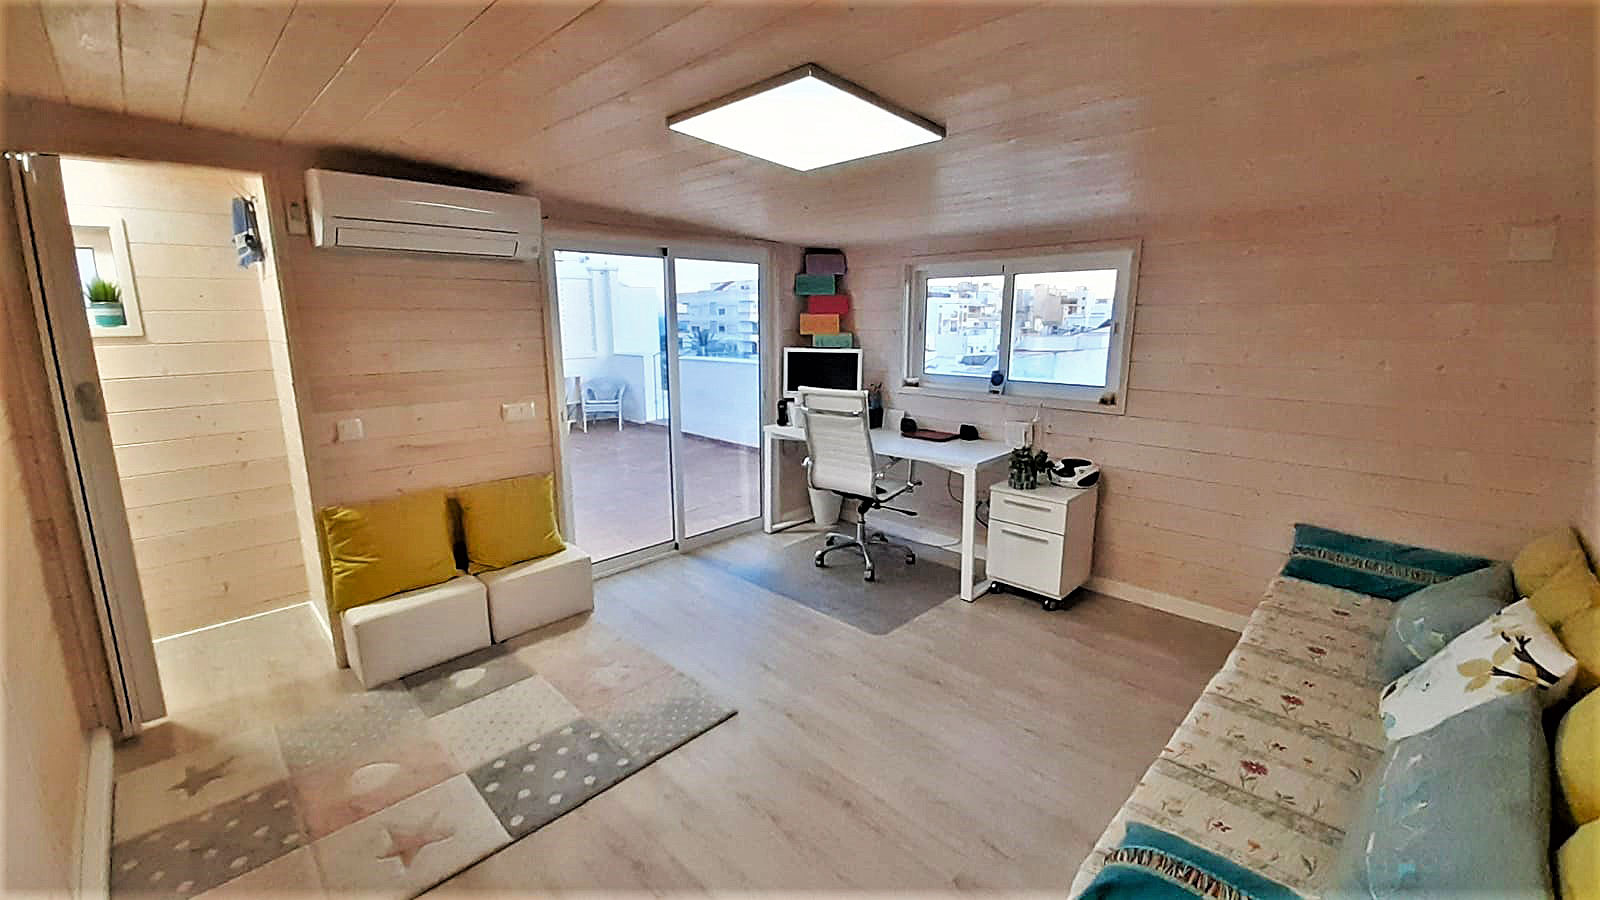 Interior caseta madera habitable Madrid 19m2 Caseta Living